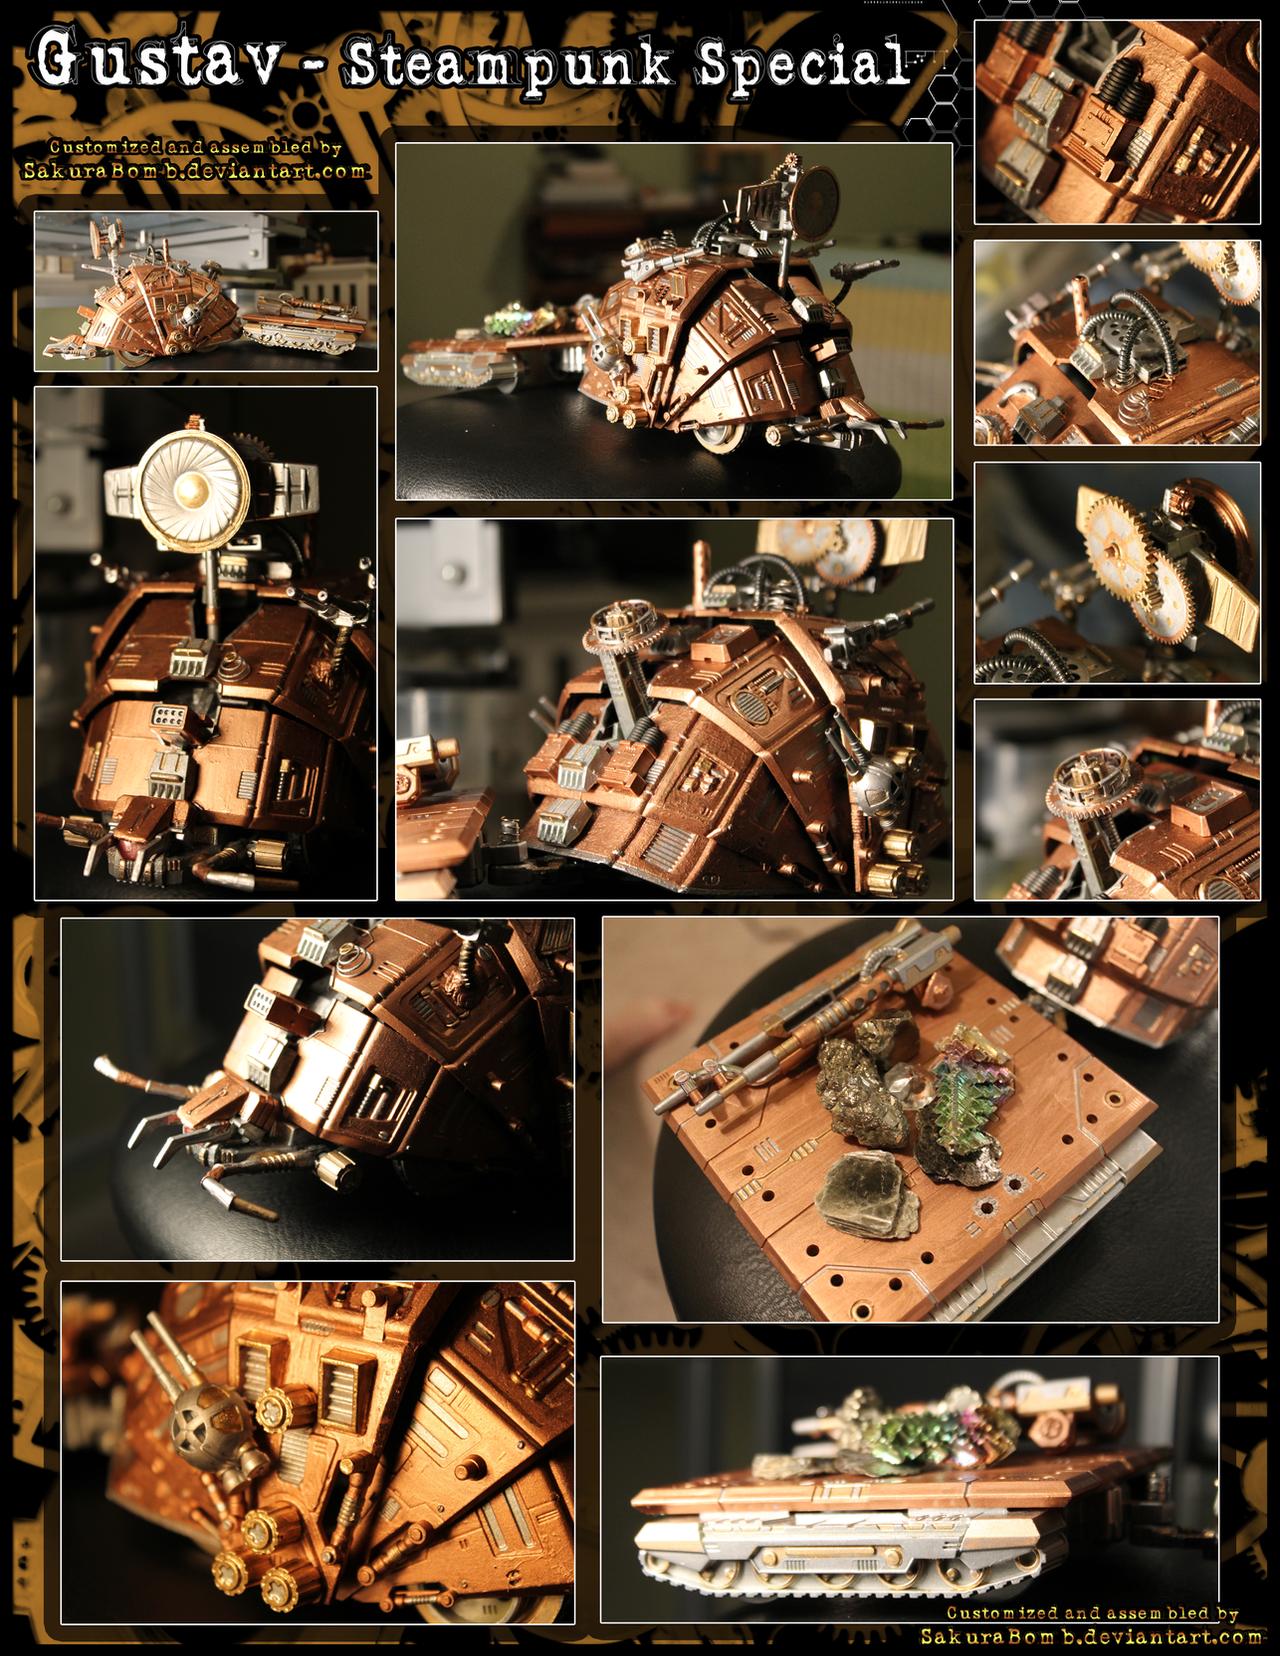 ZOIDS - Gustav Steampunk Special by SakuraBomb